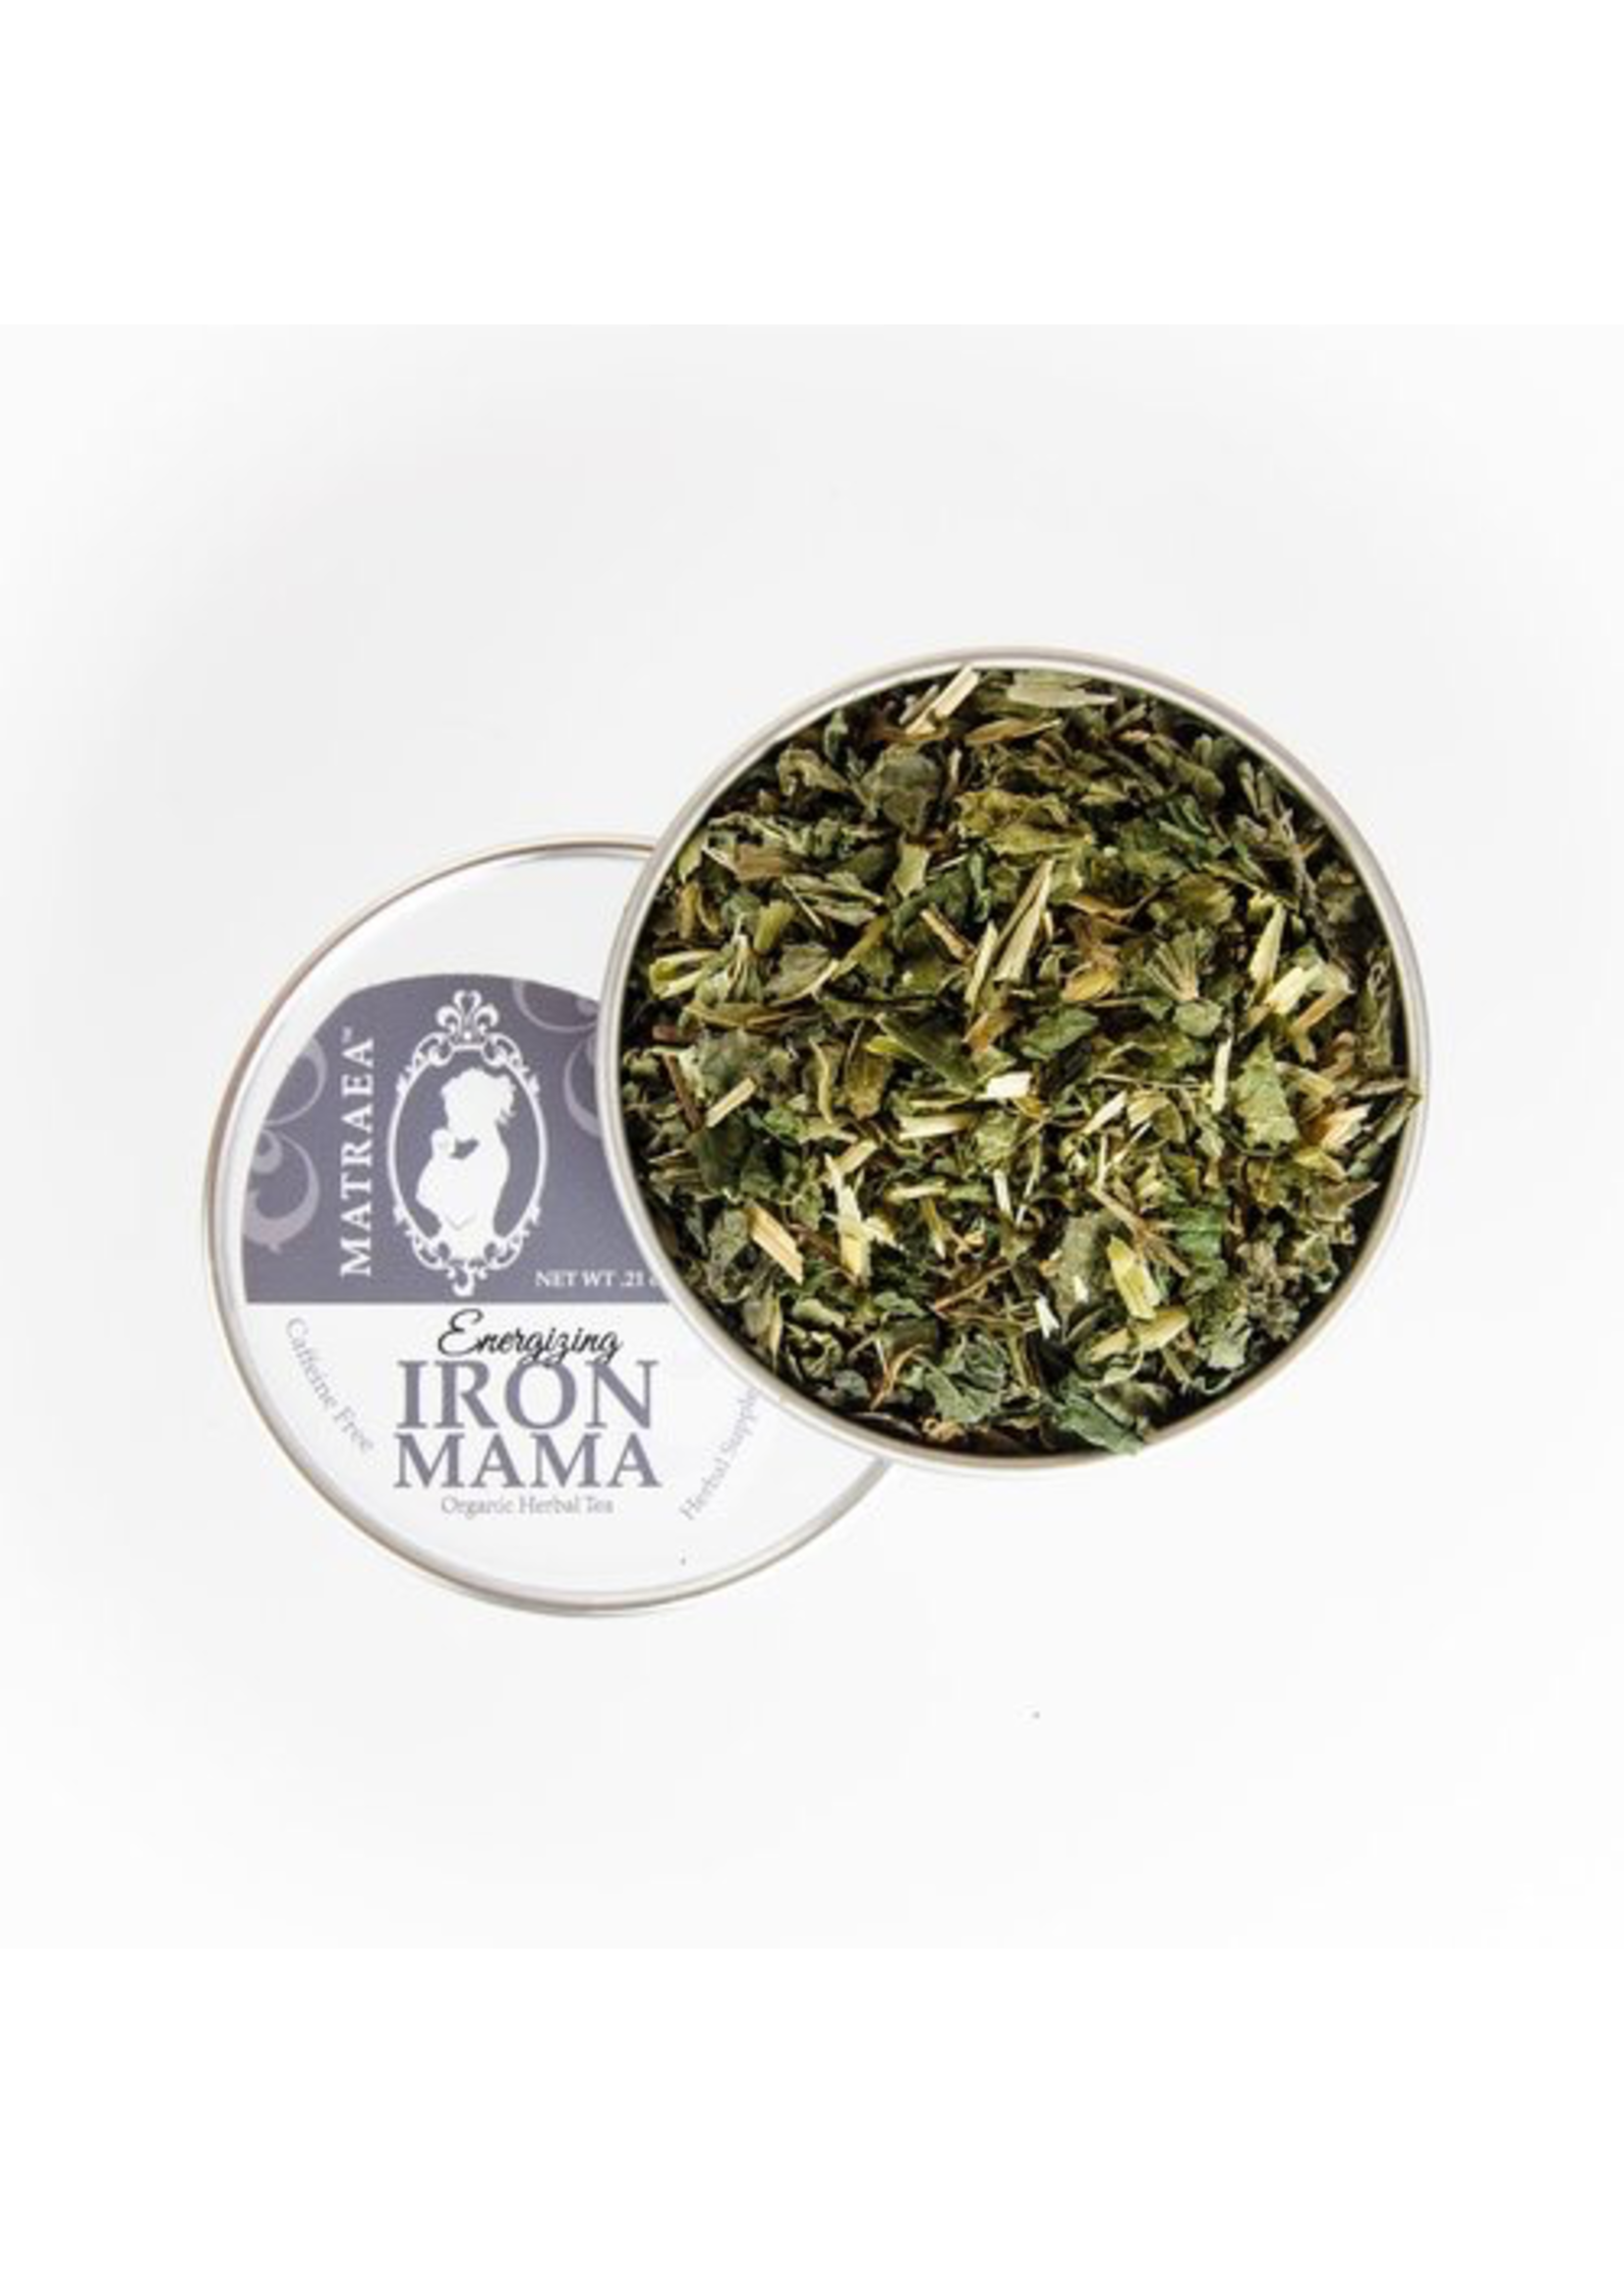 Matraea Matraea, Energizing Iron Mama Tea, 35g